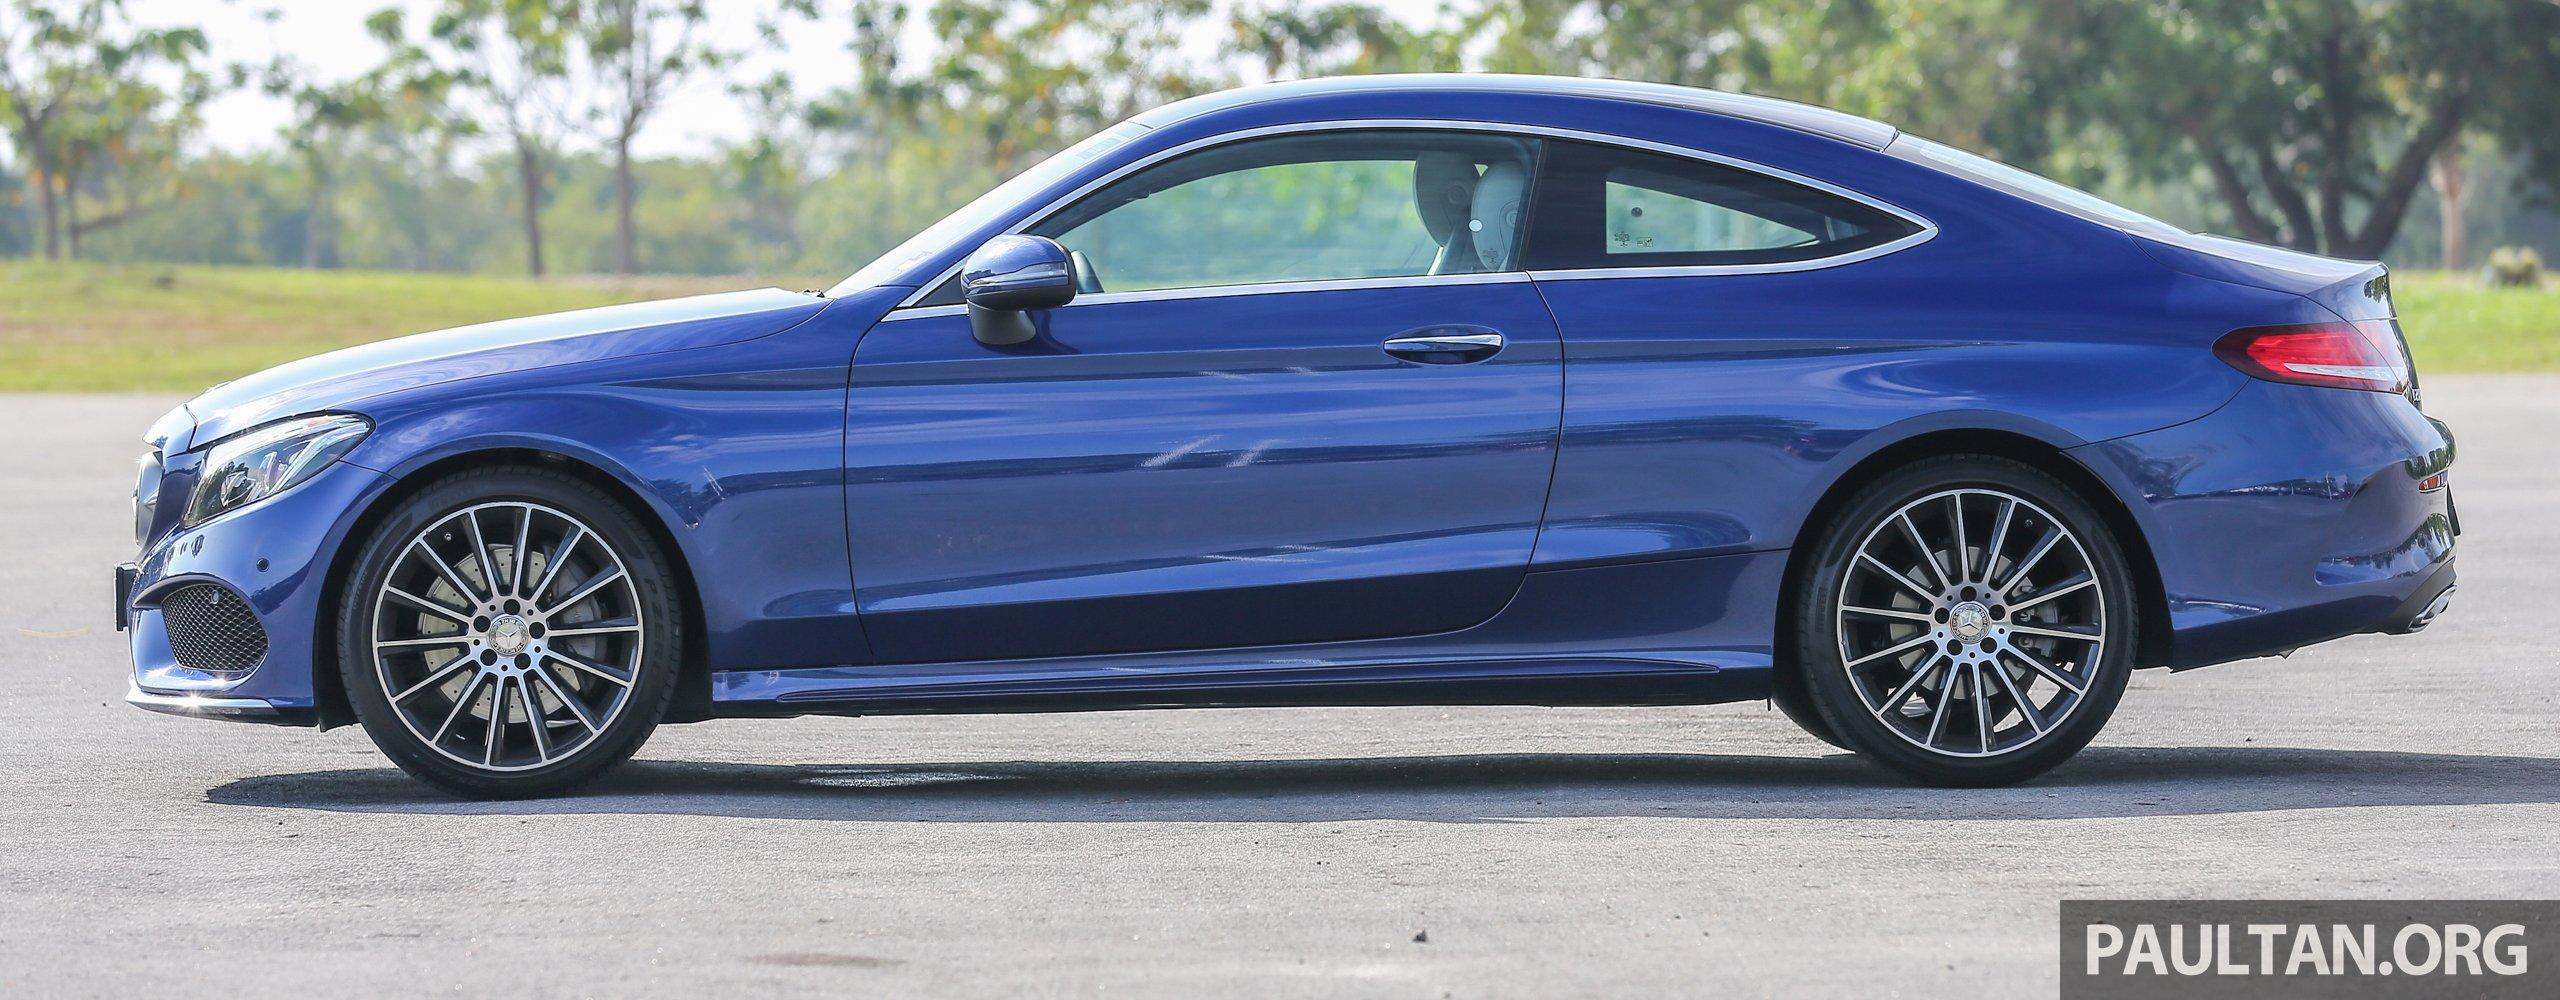 能文能武:mercedes Benz C250 Coupe 试驾心得。 Mercedesbenz C250coupe